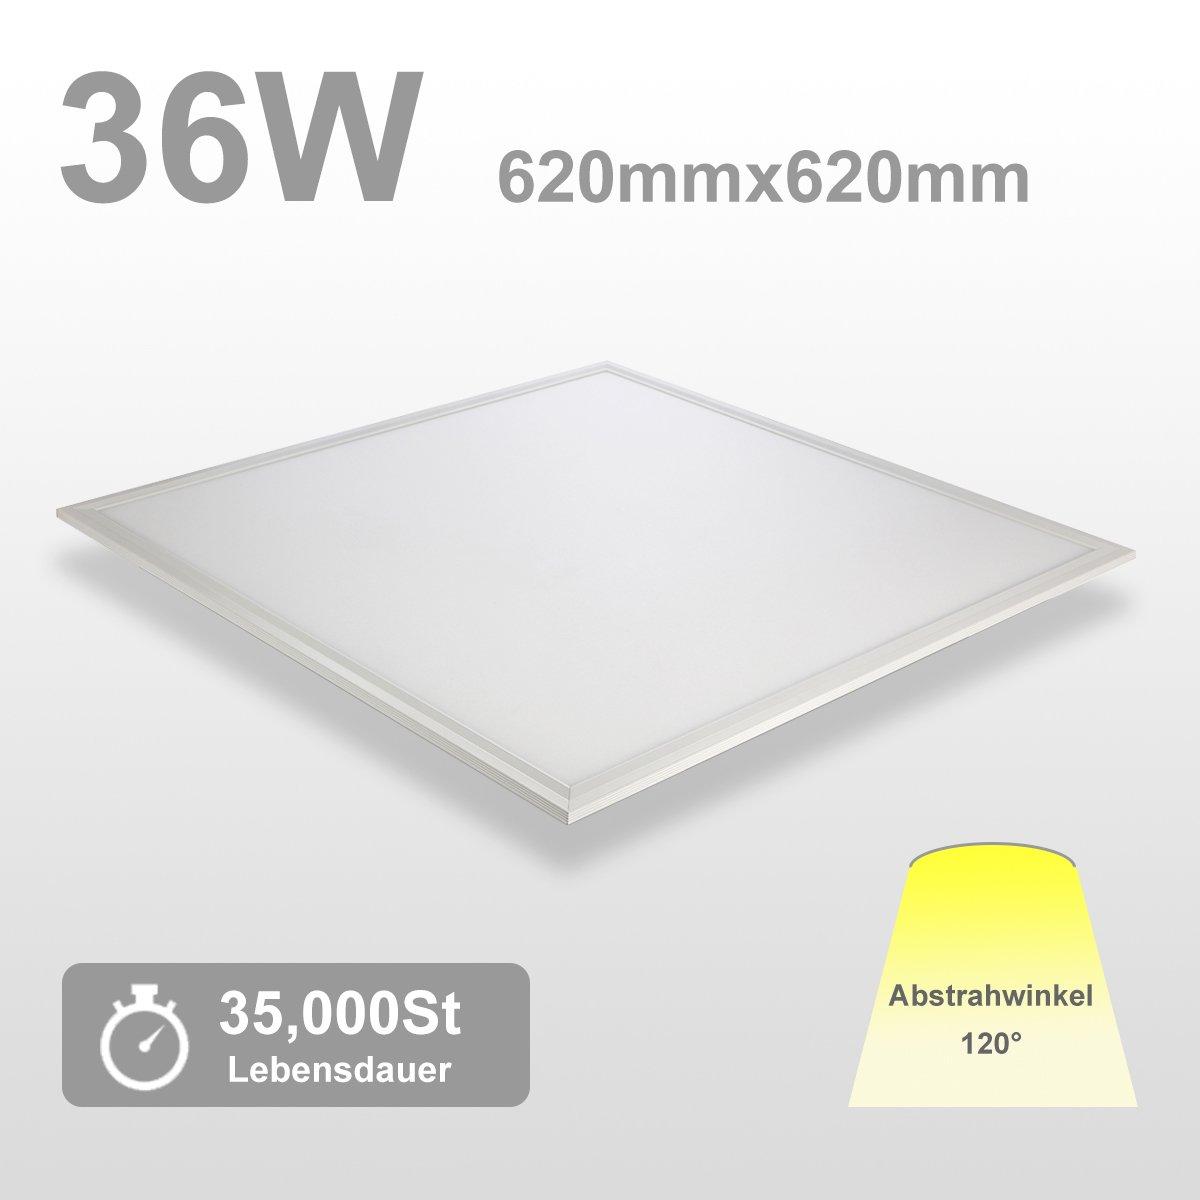 OUBO LED Panel 120x30 Deckenleuchte Neutralweiß 40W, 3200lm, 4000K Wandleuchte dünn Ultraslim Weißrahmen [Energieklasse A+]